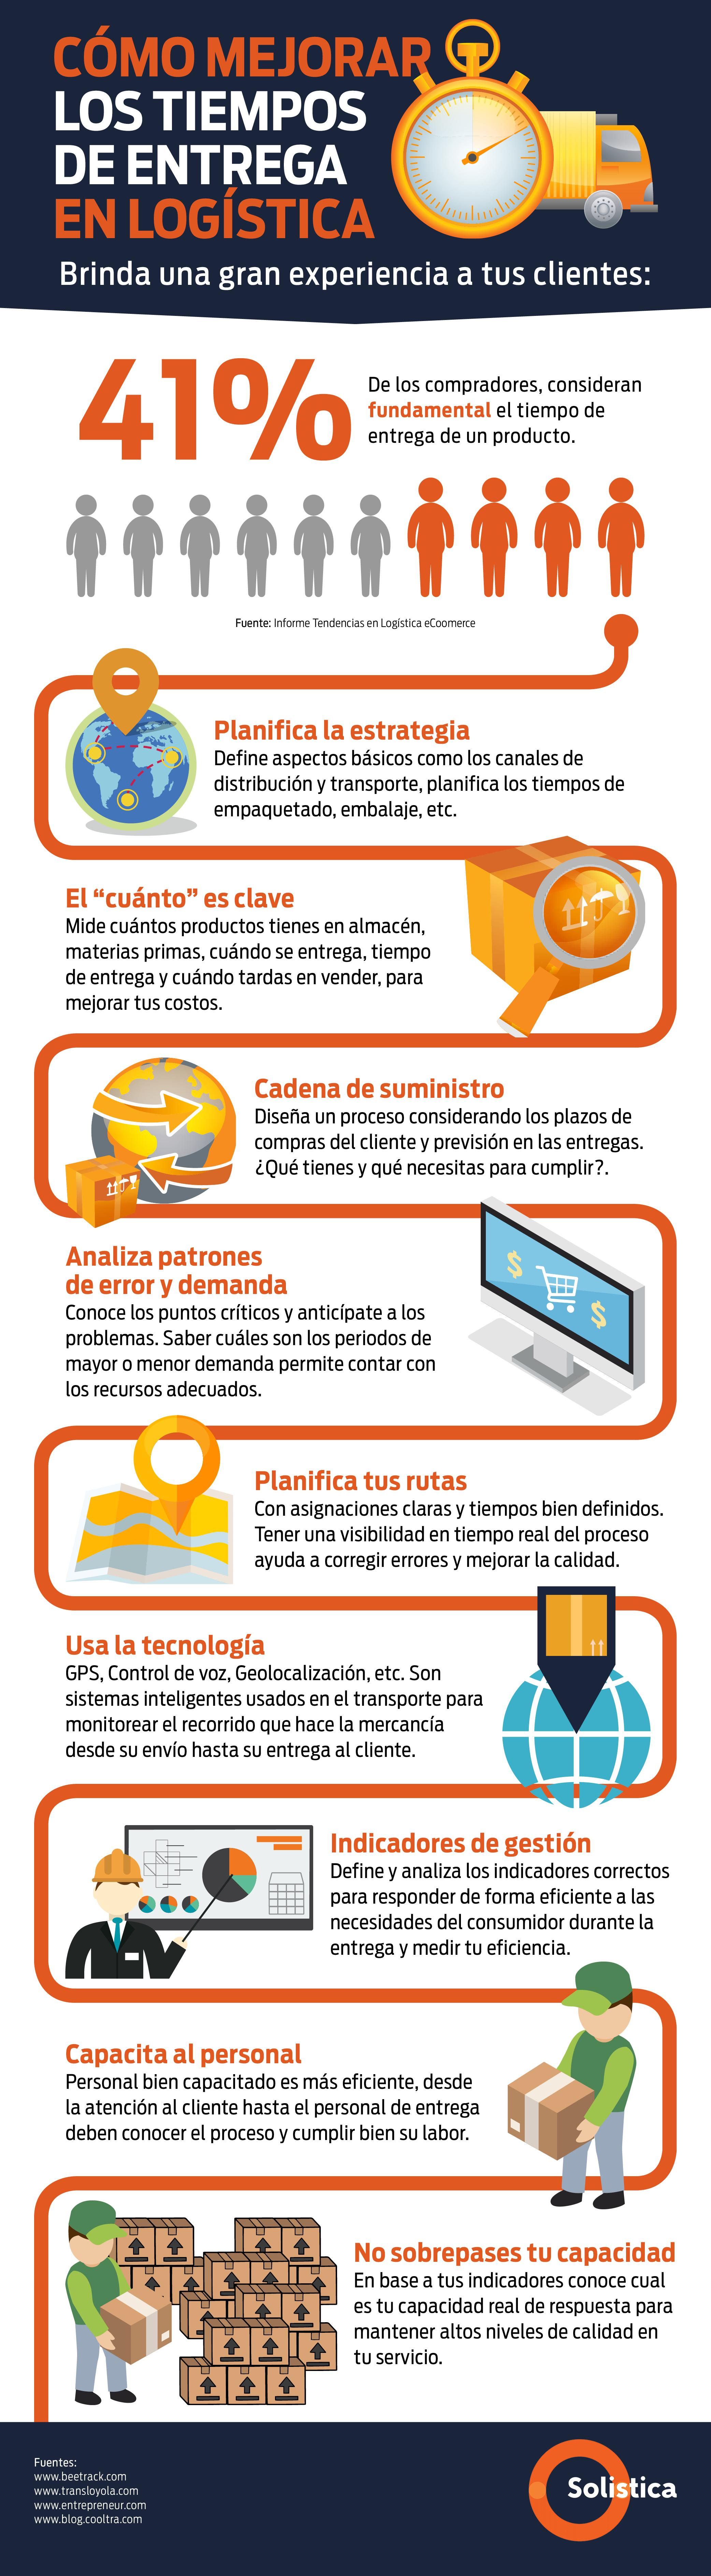 2_infografia_solistica_mayo_1